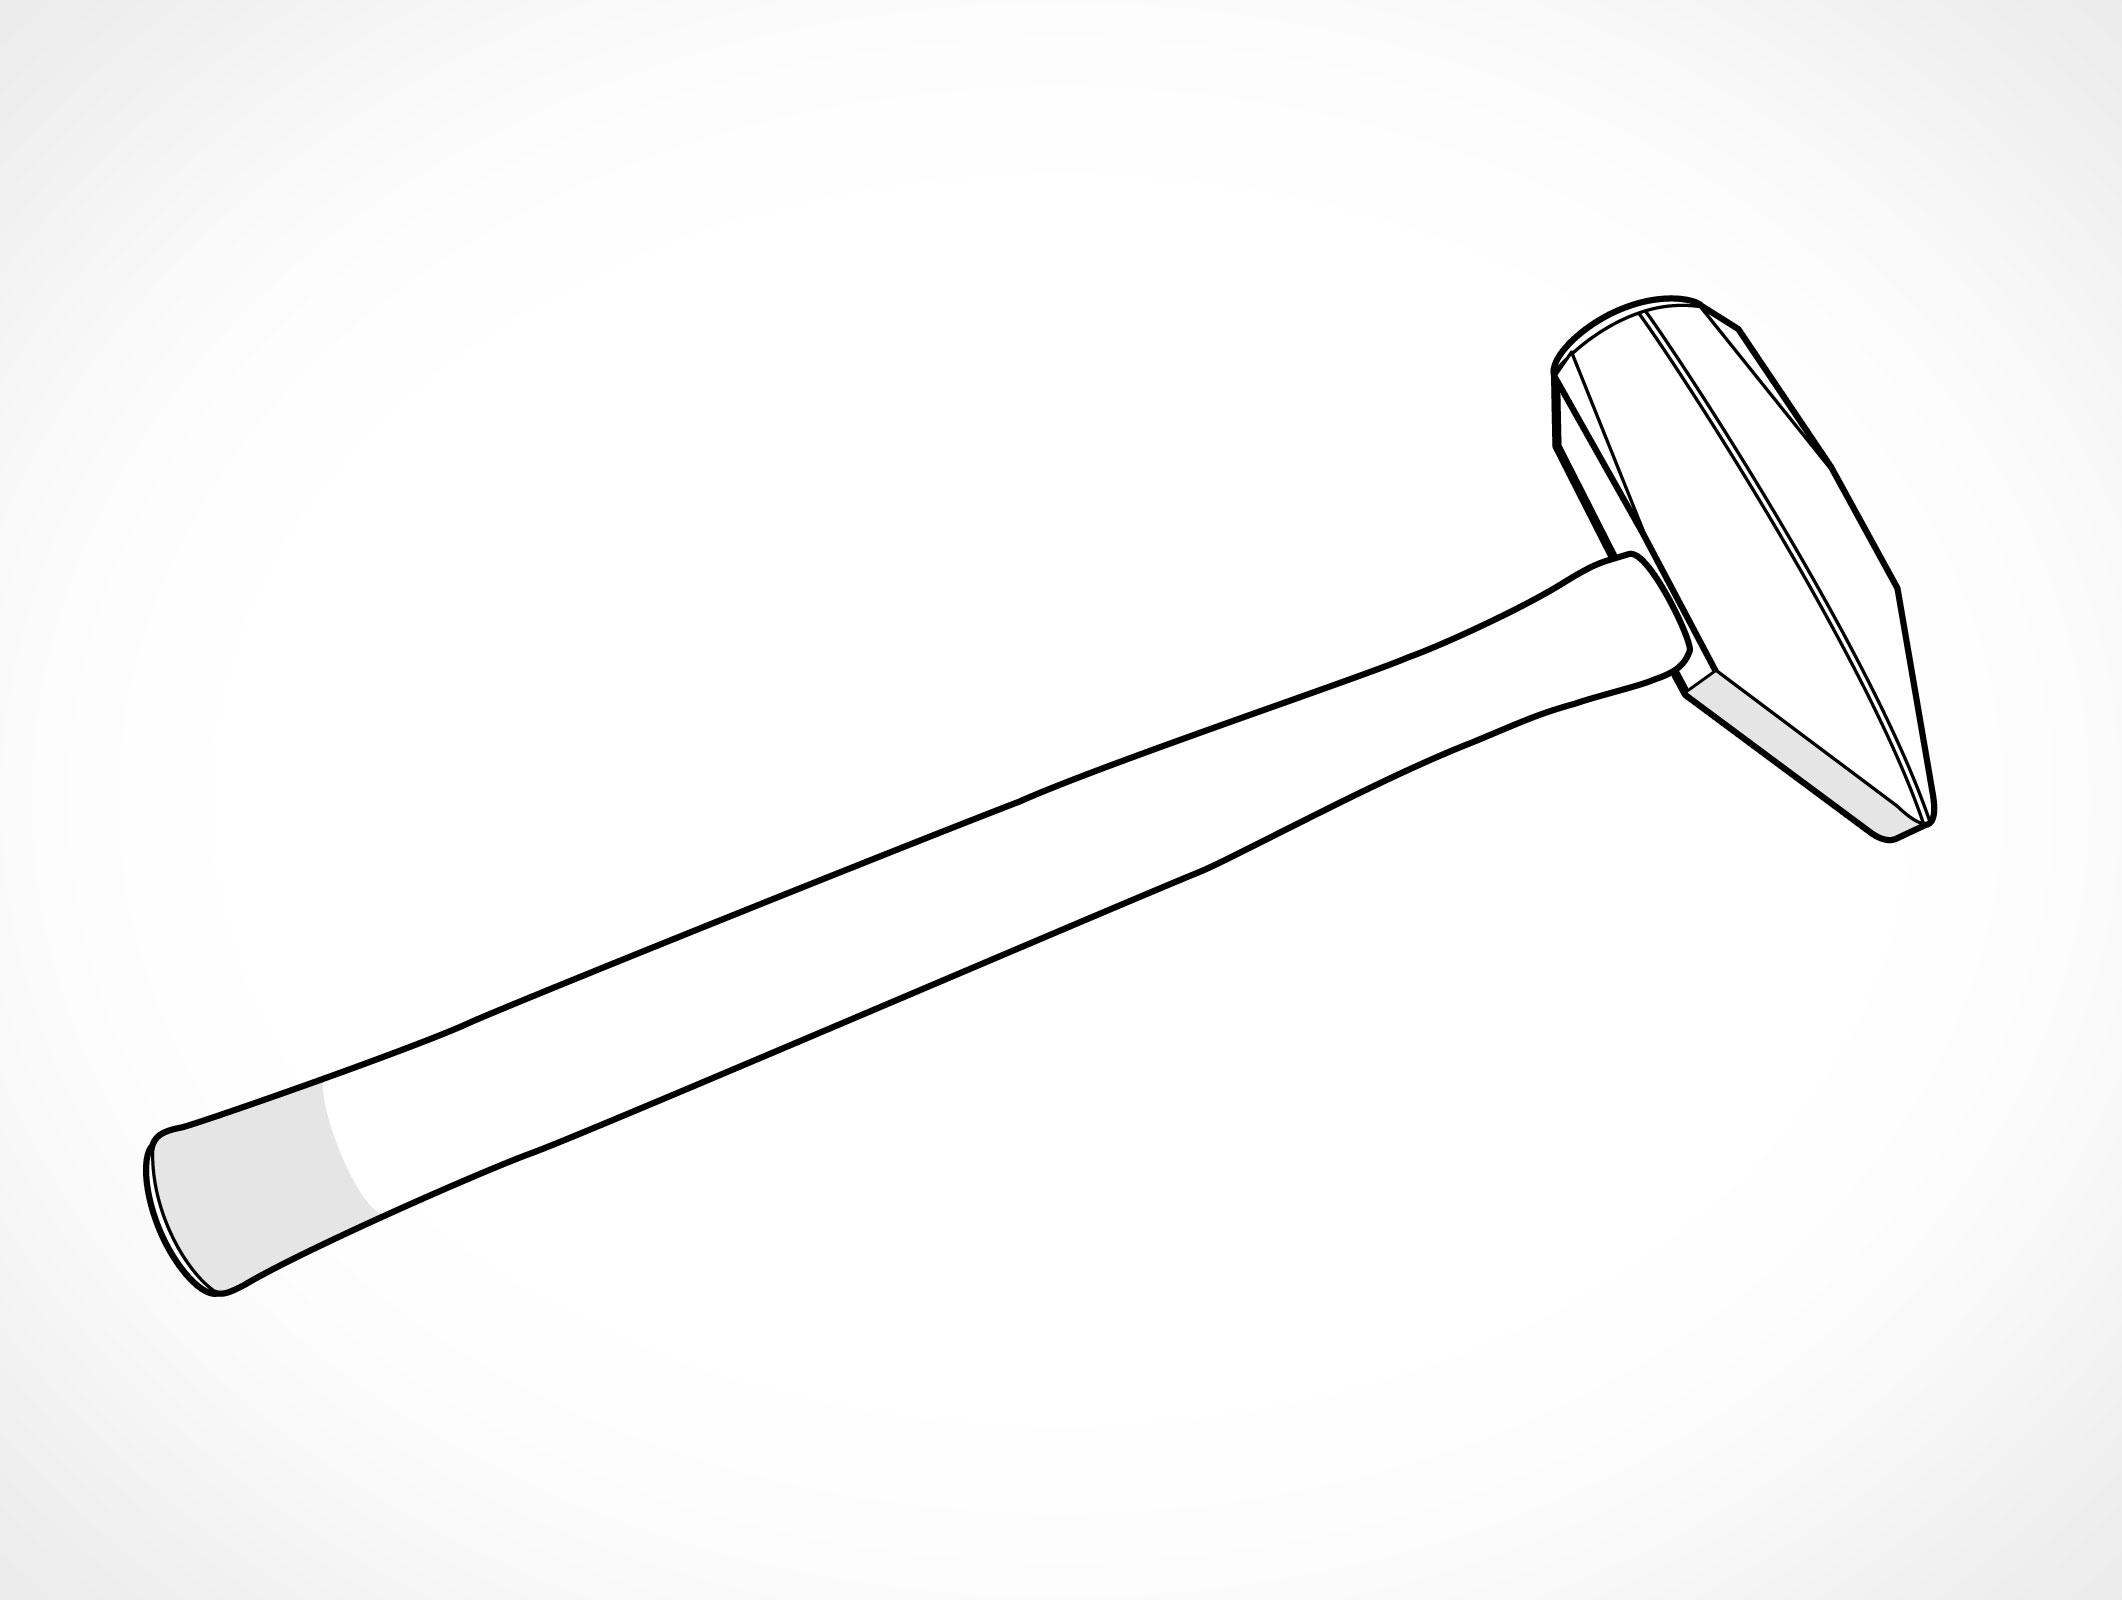 Metal Pounds Bonding Hammer Vector Tools